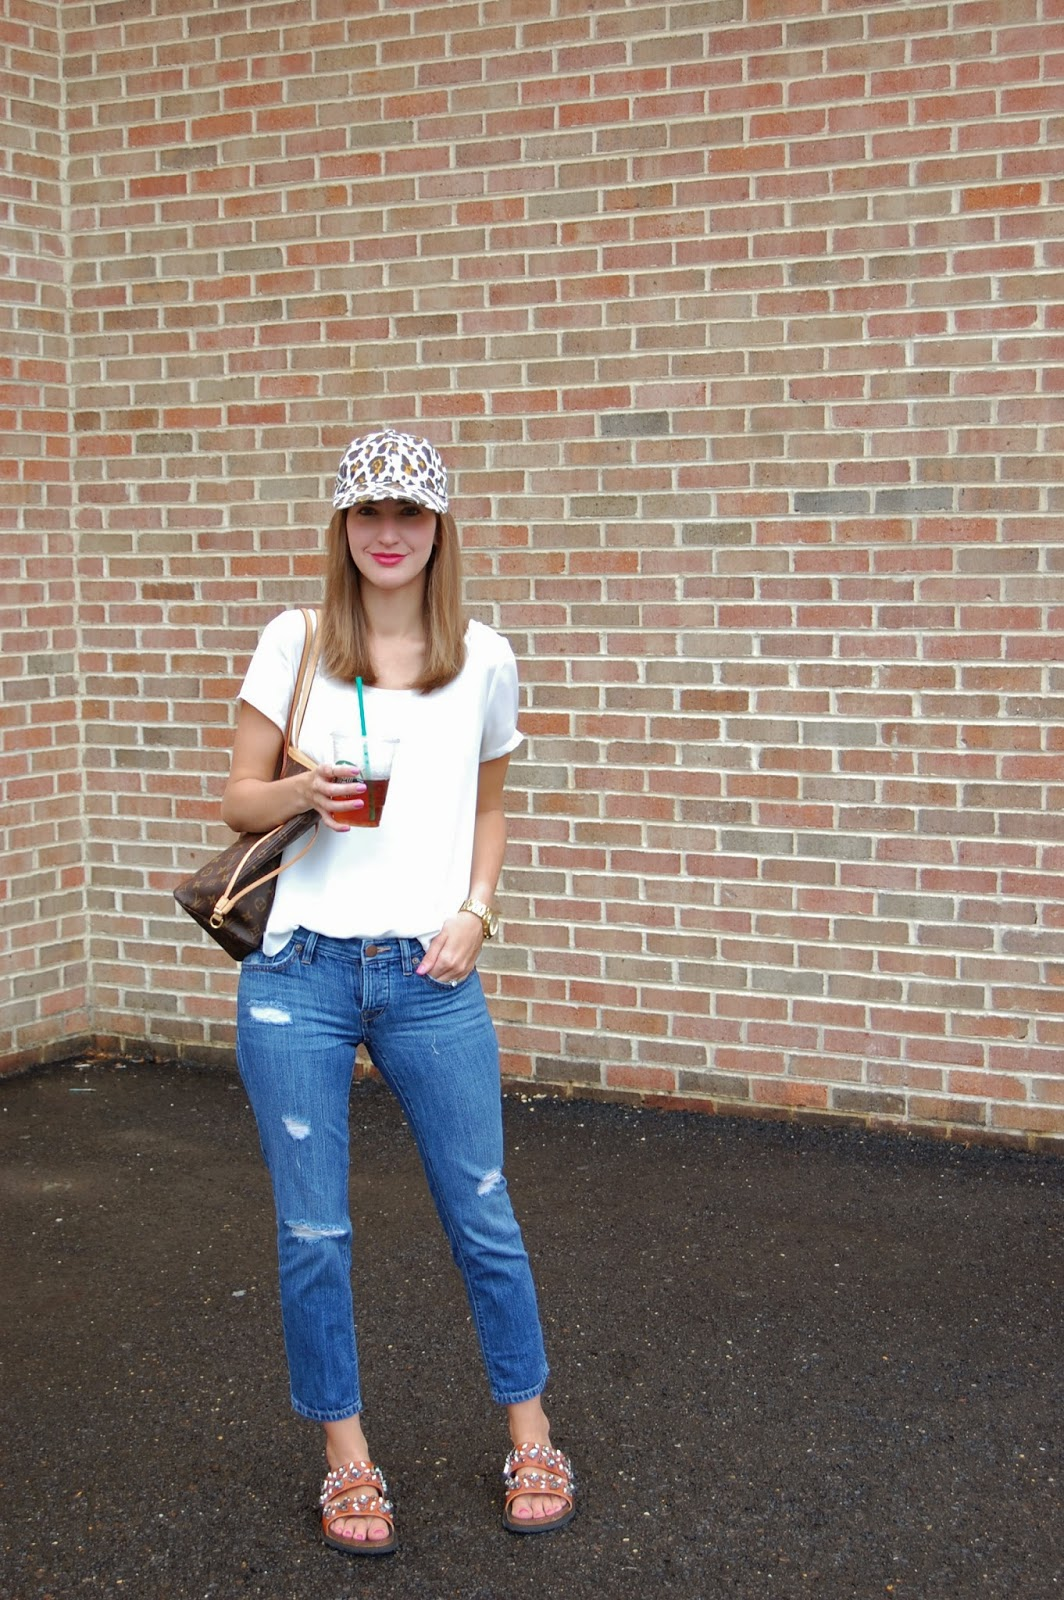 Wearing Jcrew leopard print canvas hat, Nordstrom Lilly side slit tee, Loft boyfriend jeans, Zara leather bio with jewels sandals, Louis Vuitton Neverfull mm, casual weekend look 2014